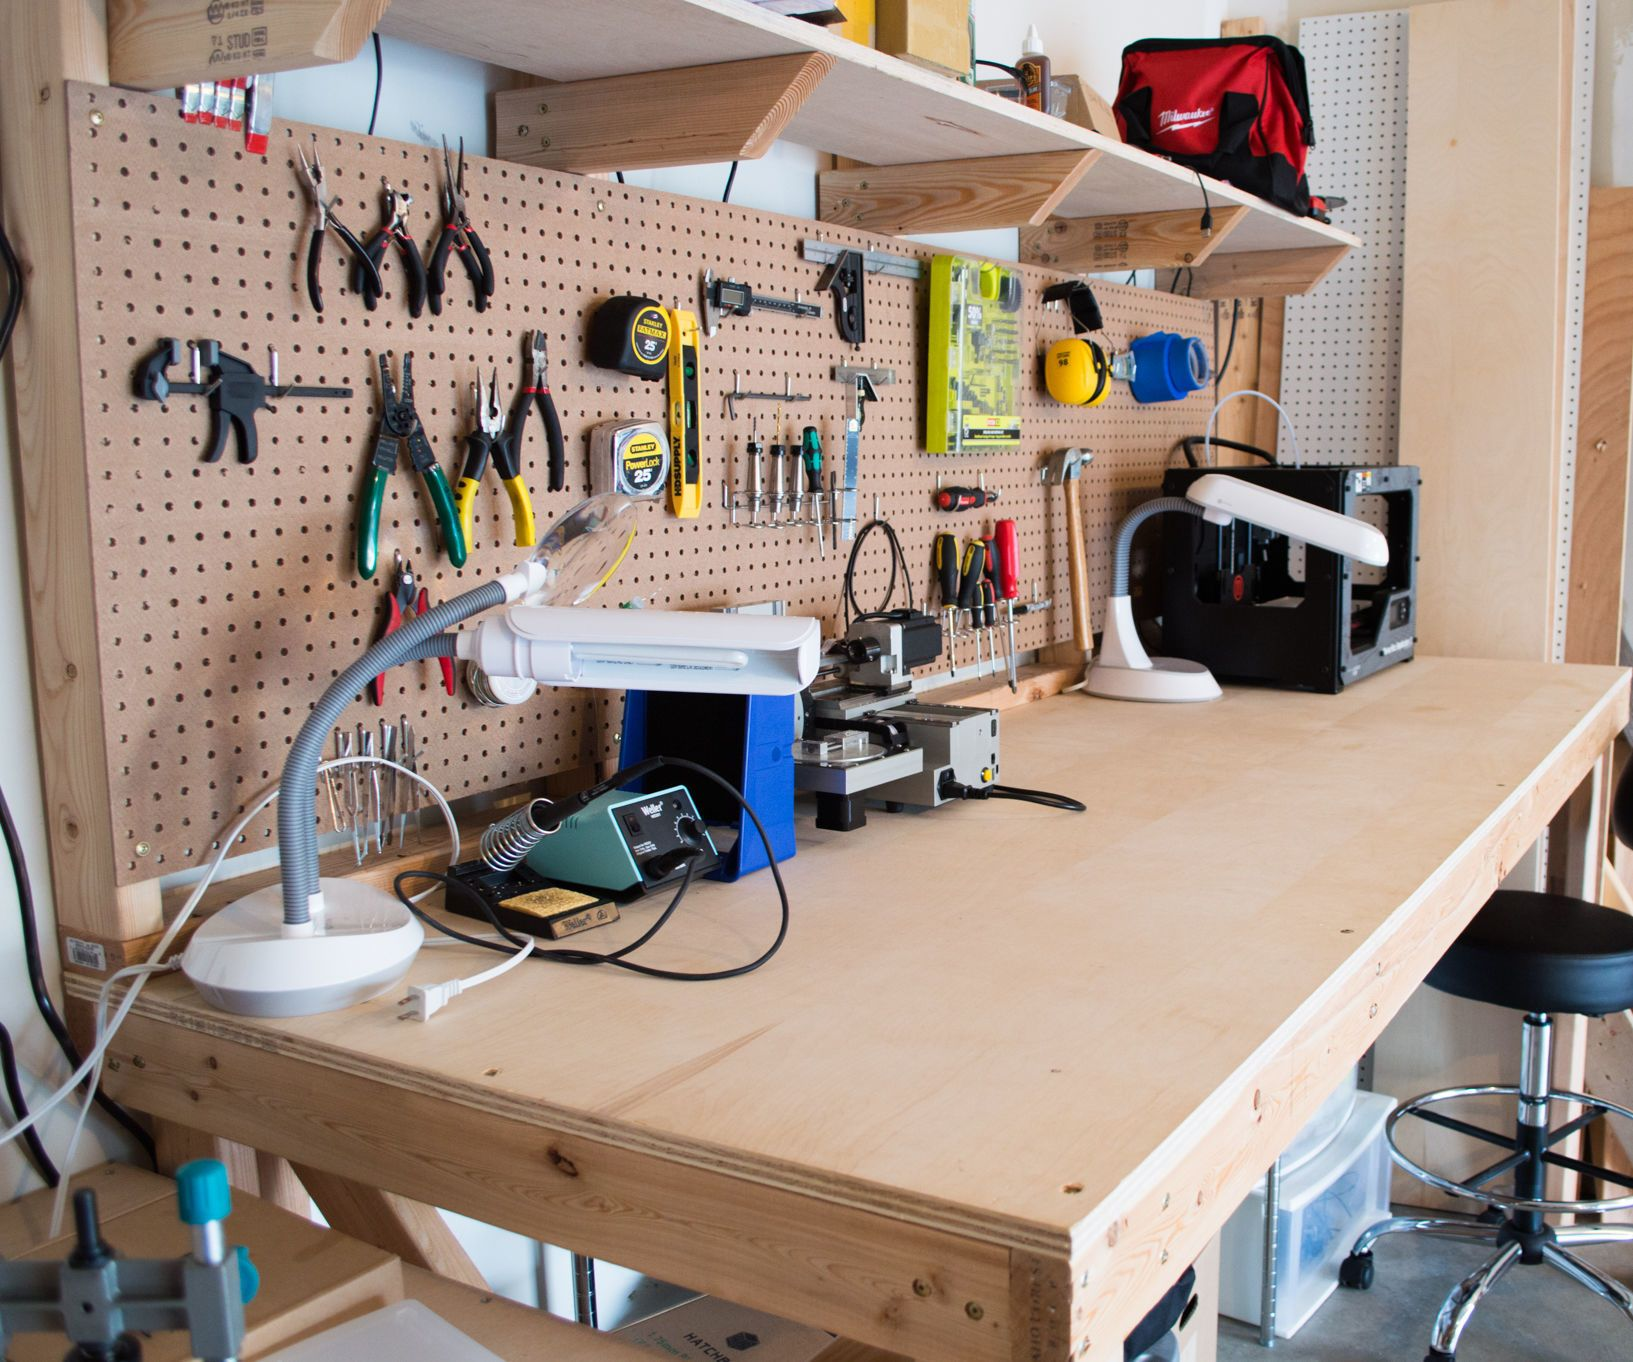 Customizable Work Bench Workbench Computer Repair Workbench Diy Desk